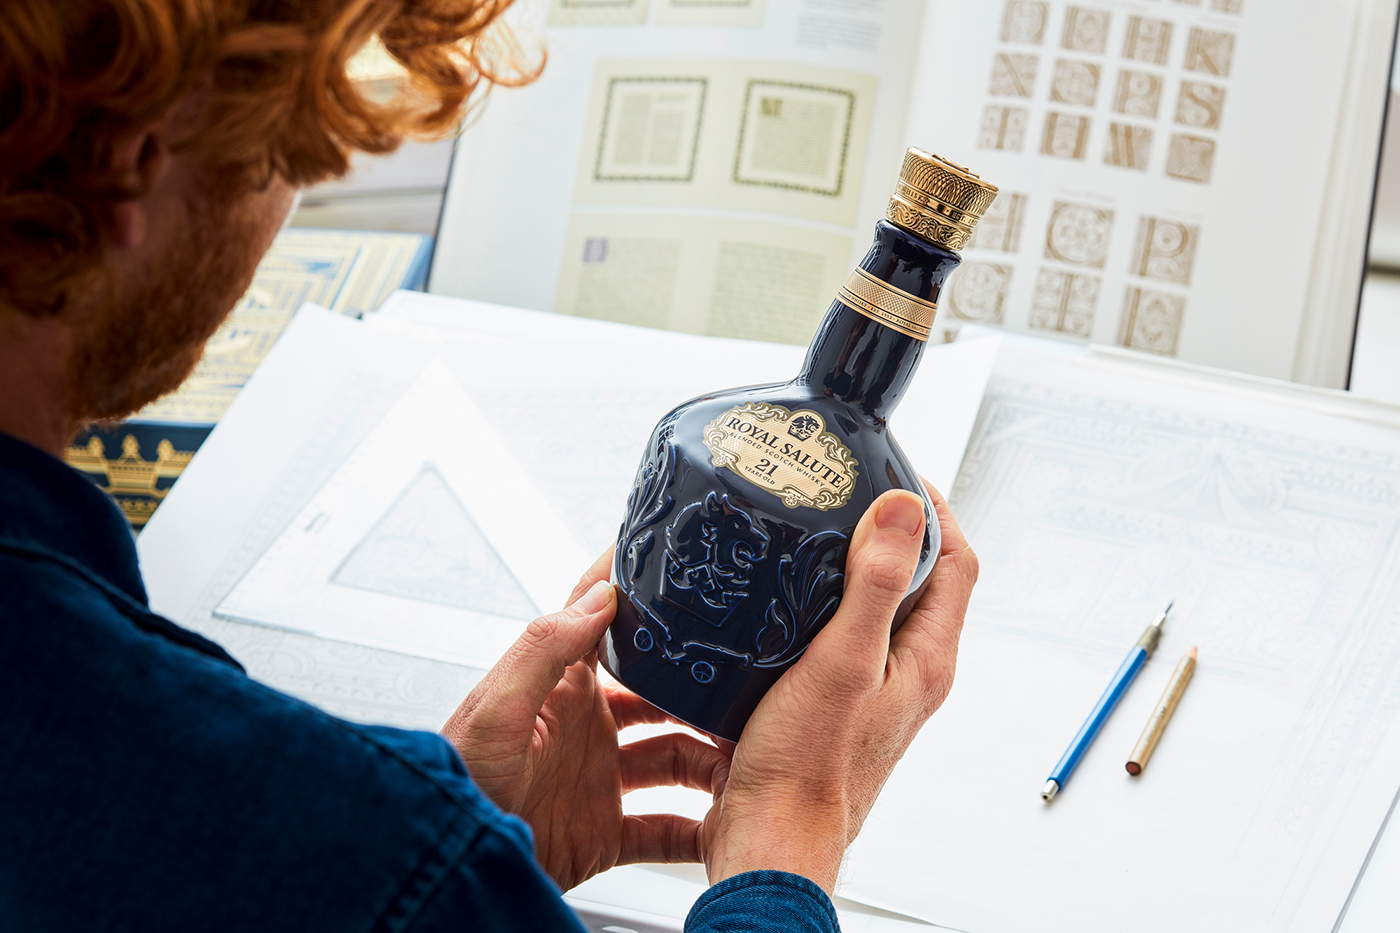 Packaging beverage Spirits Whisky decorative ornate luxury